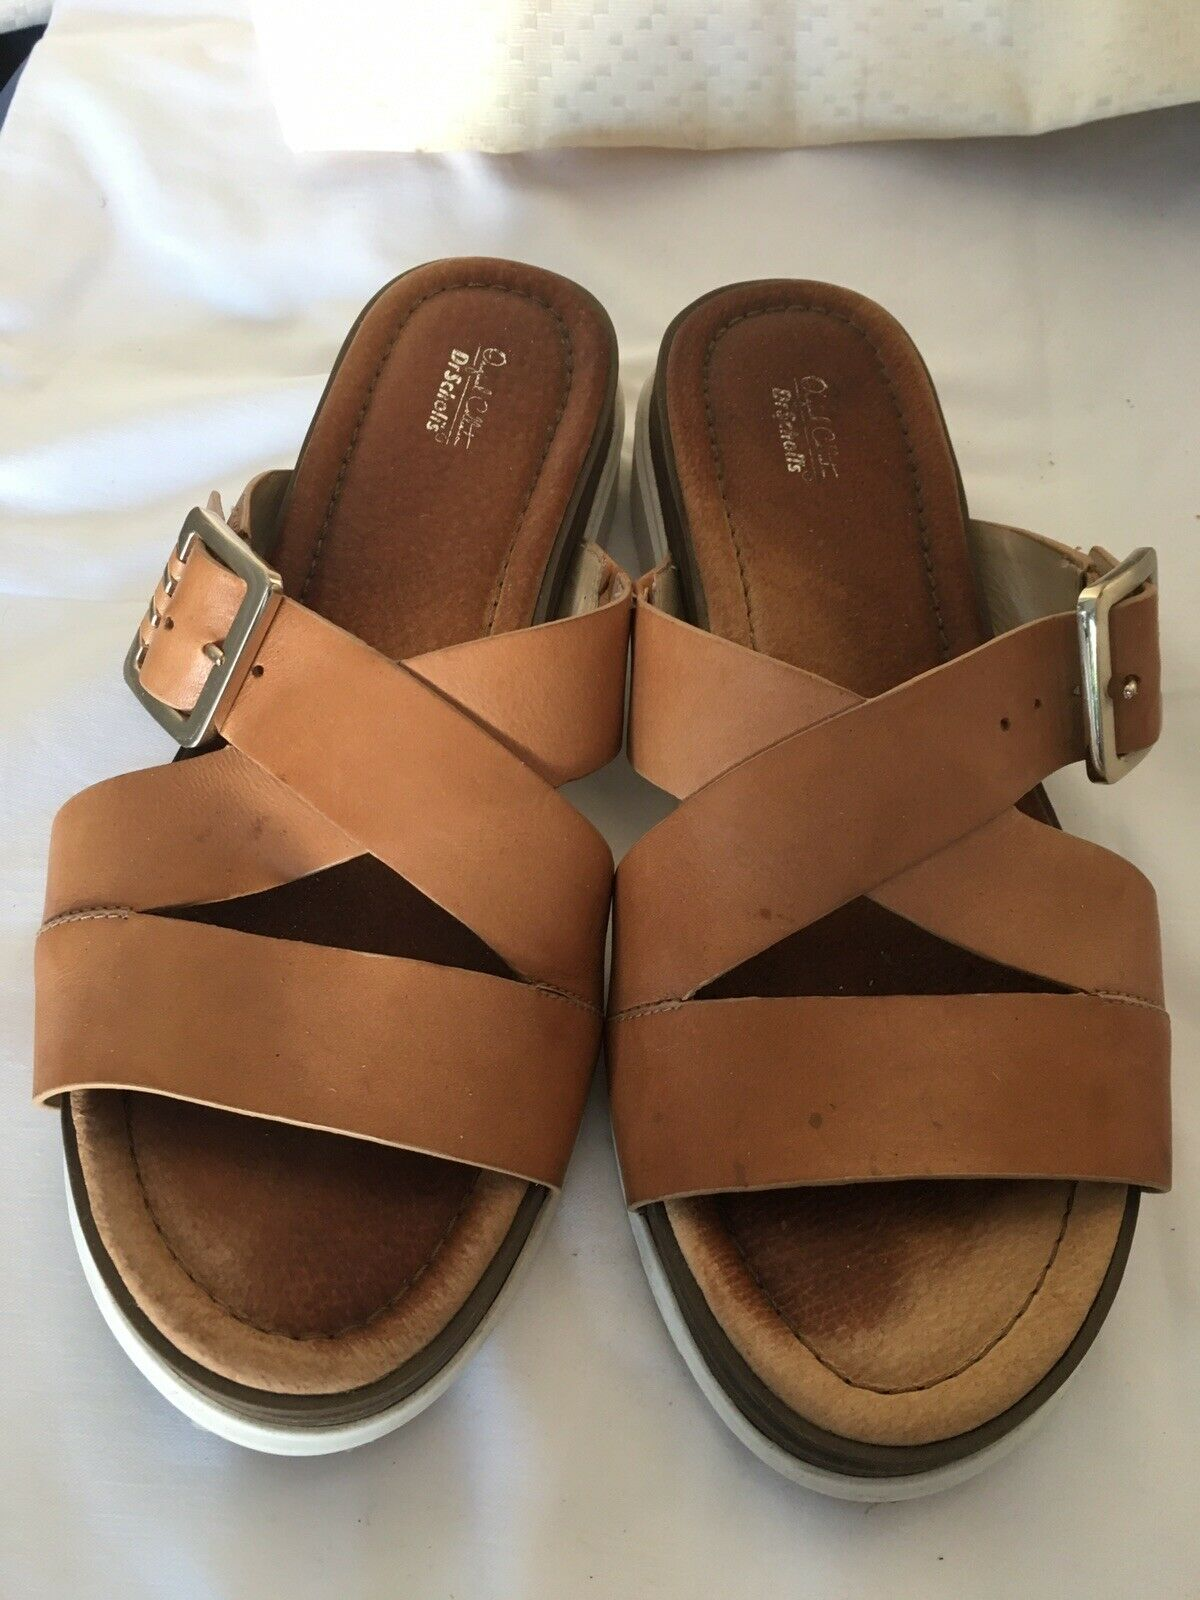 Dr. Scholls Original Collection Womens brown leather Sandal Sz 8.5